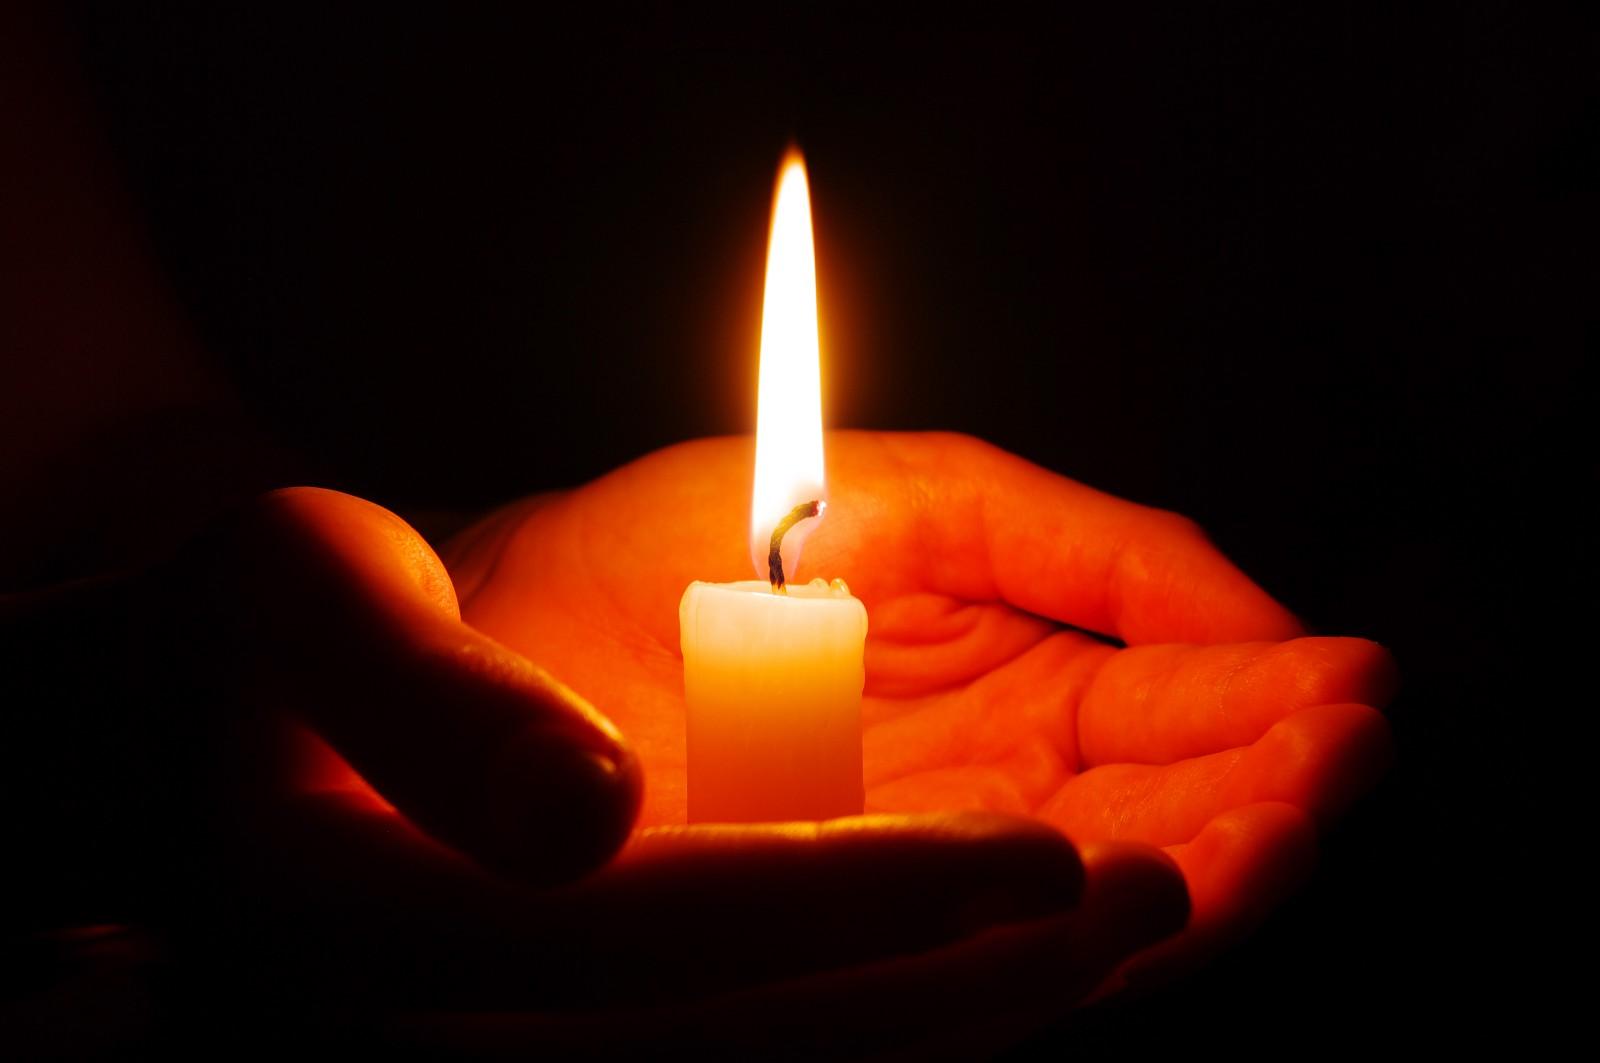 Картинки, картинки с горящей свечой скорби